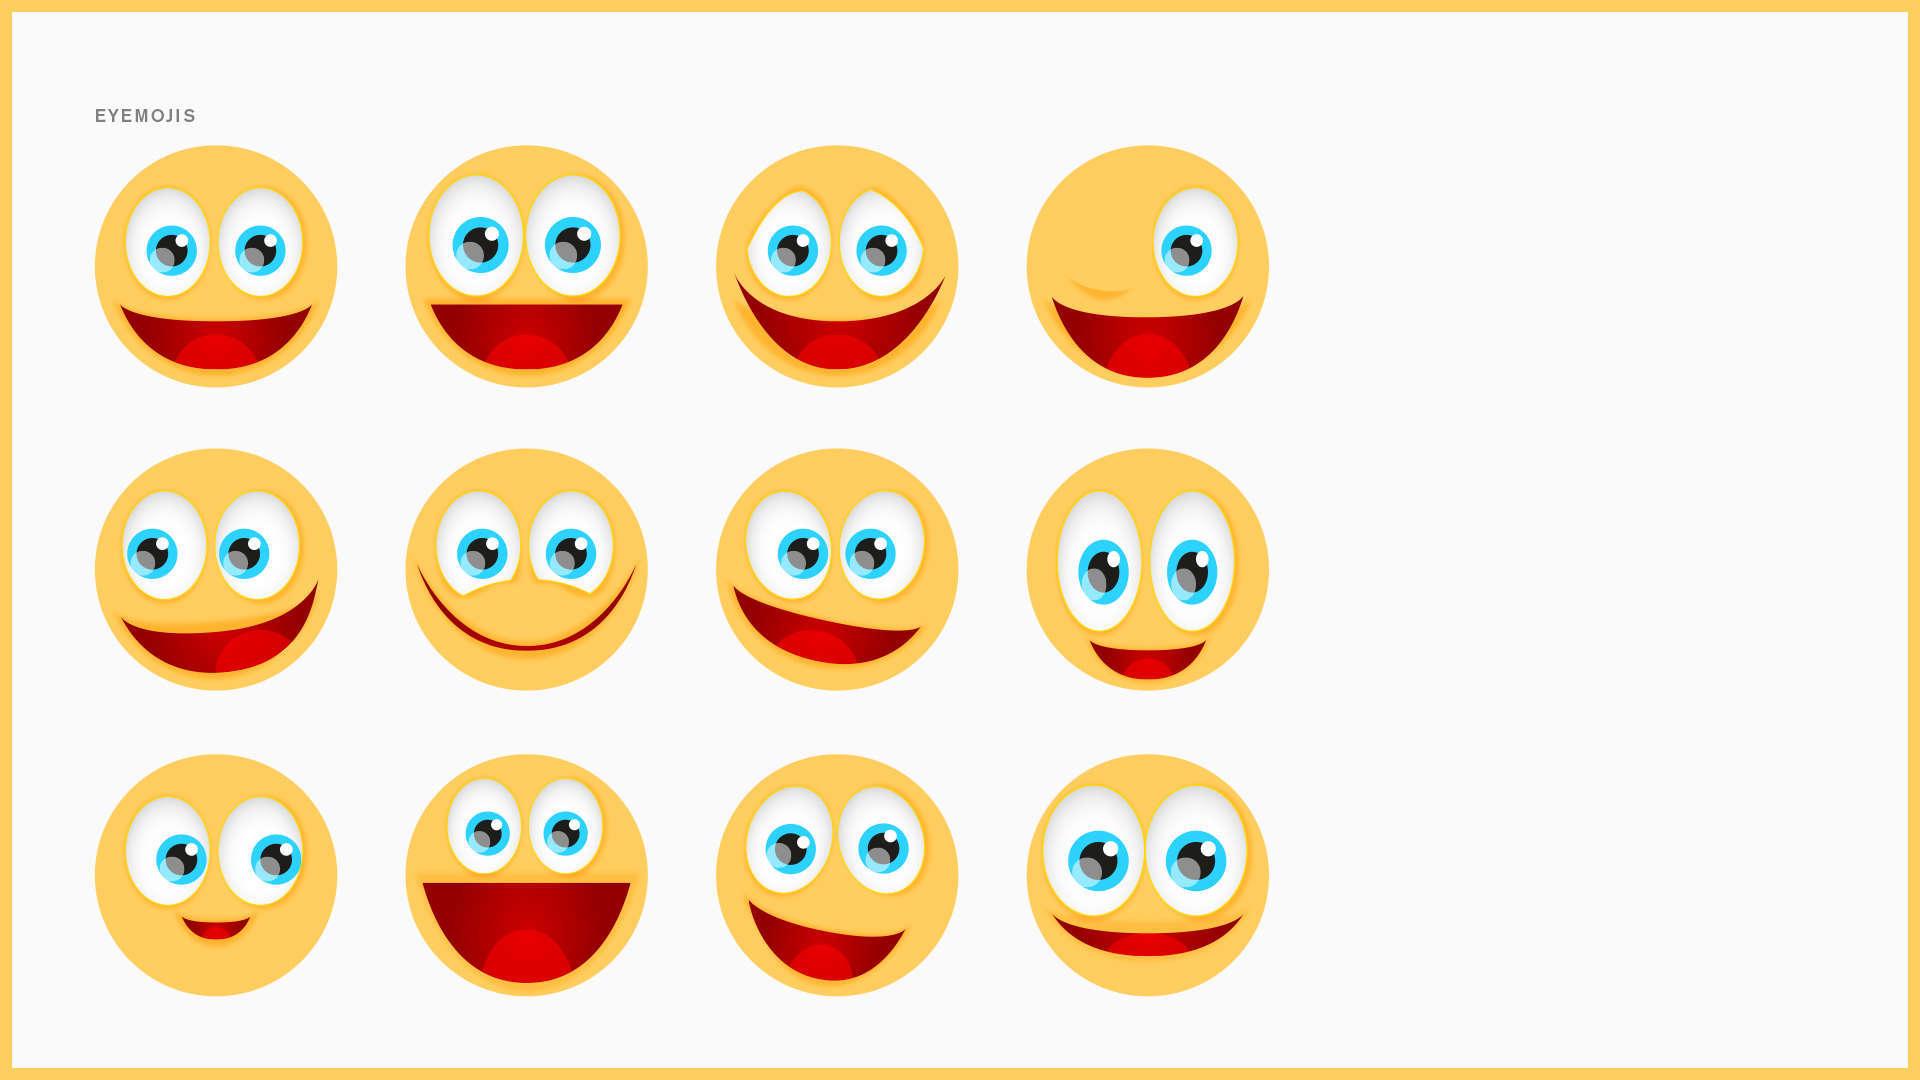 Wallpaper New Emoji Hd Wallpaper 1080p Upload at October 1 2015 by 1920x1080